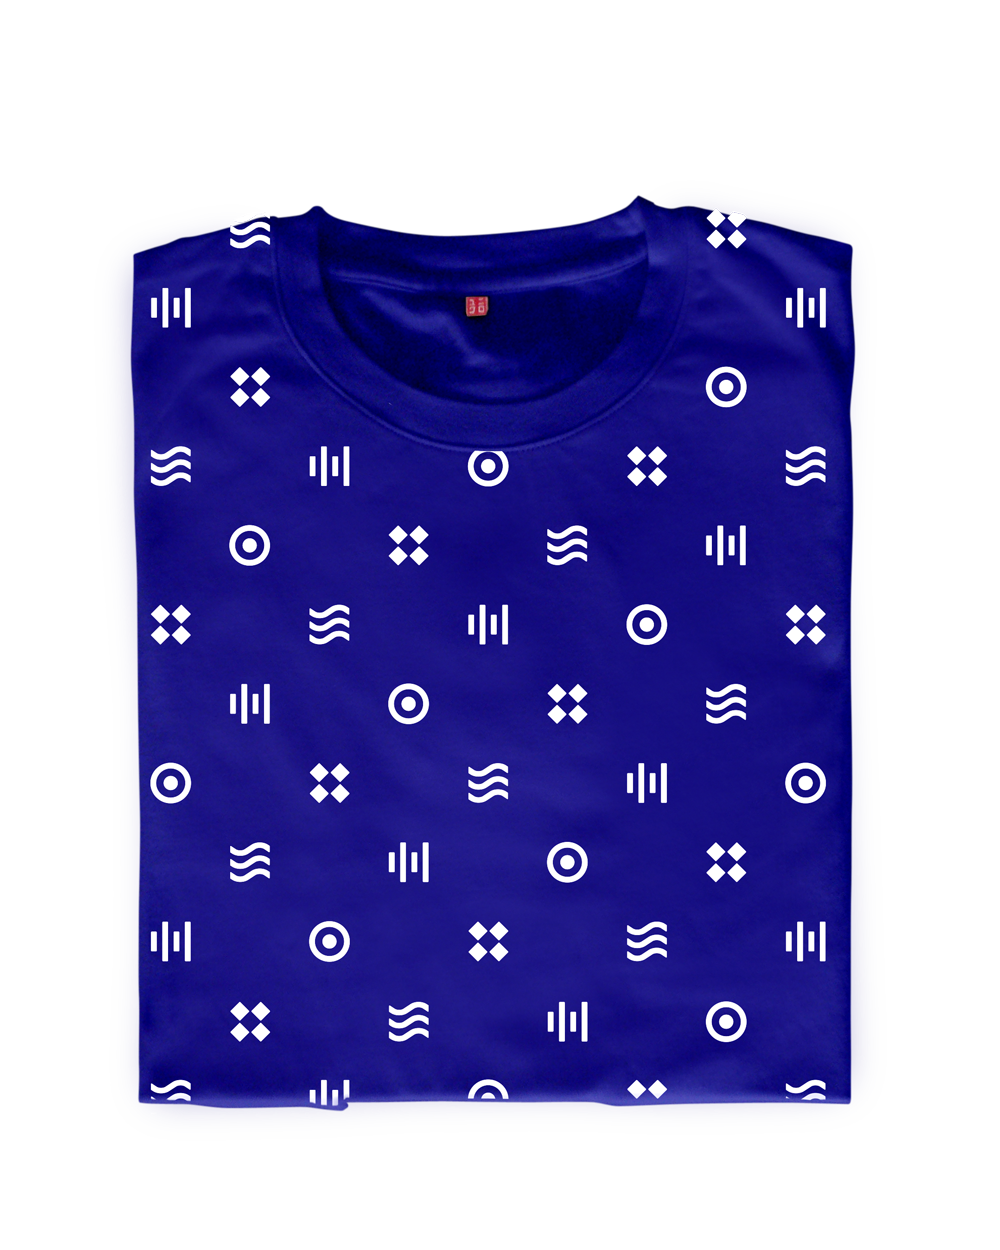 vlevle-pool-tshirt-printvlevle-pool-design-gaelle_de_laveleye